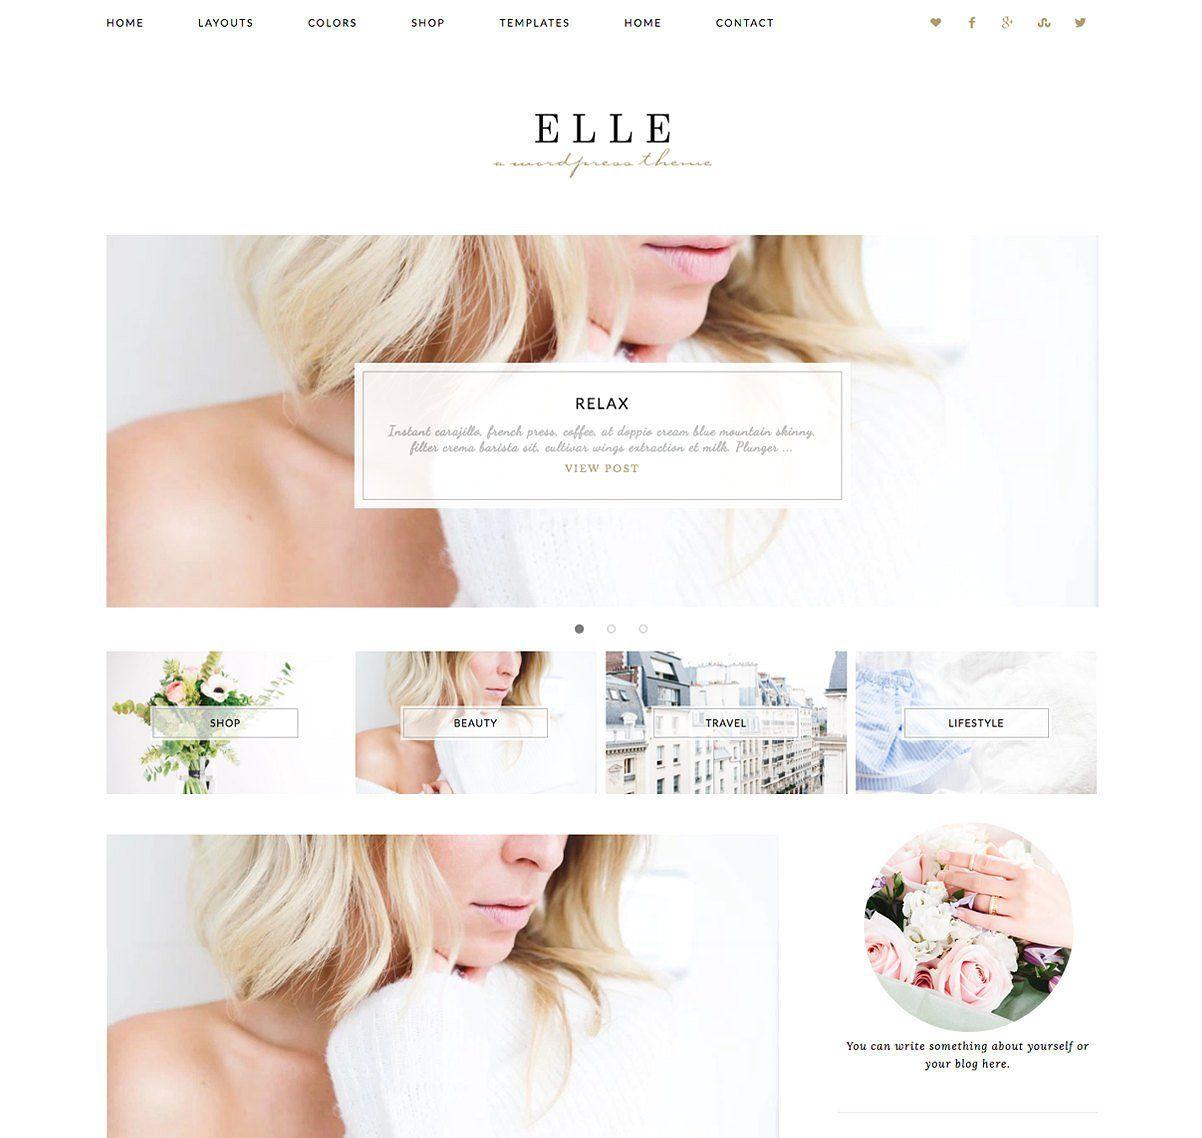 50 Modern, Minimal, Feminine Wordpress Blog Themes   Brazen Biz